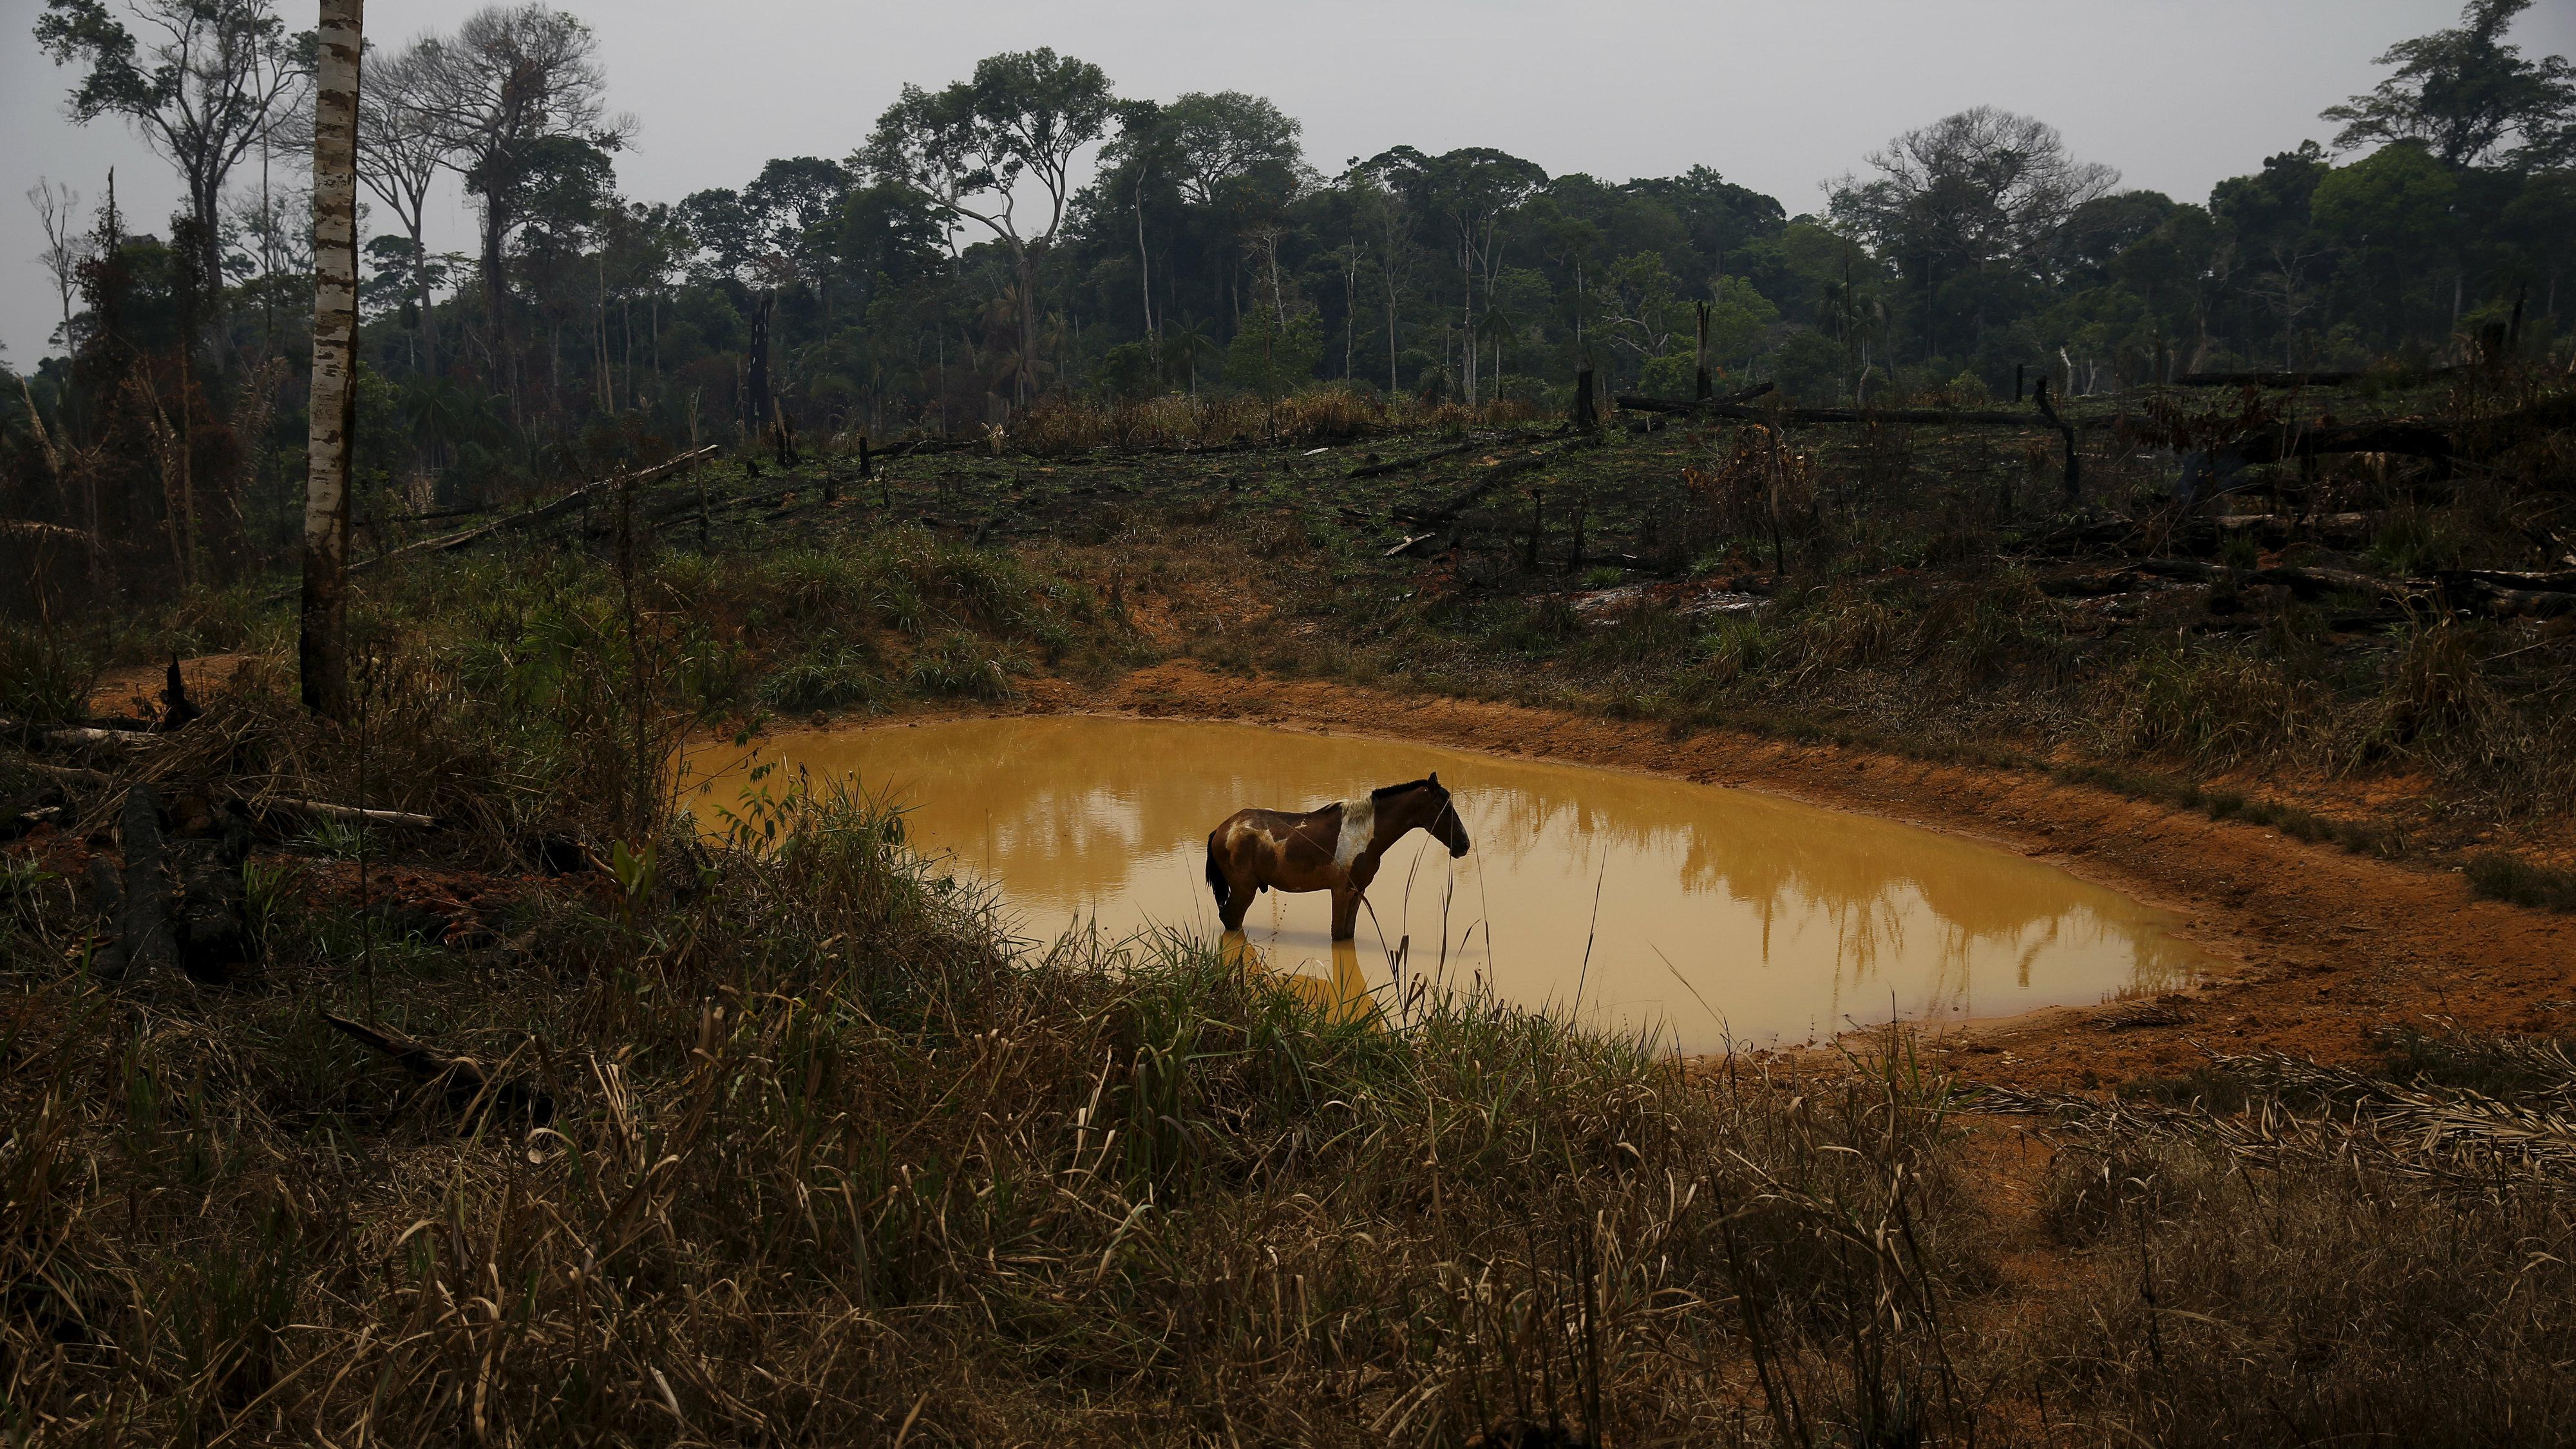 horse in deforestation